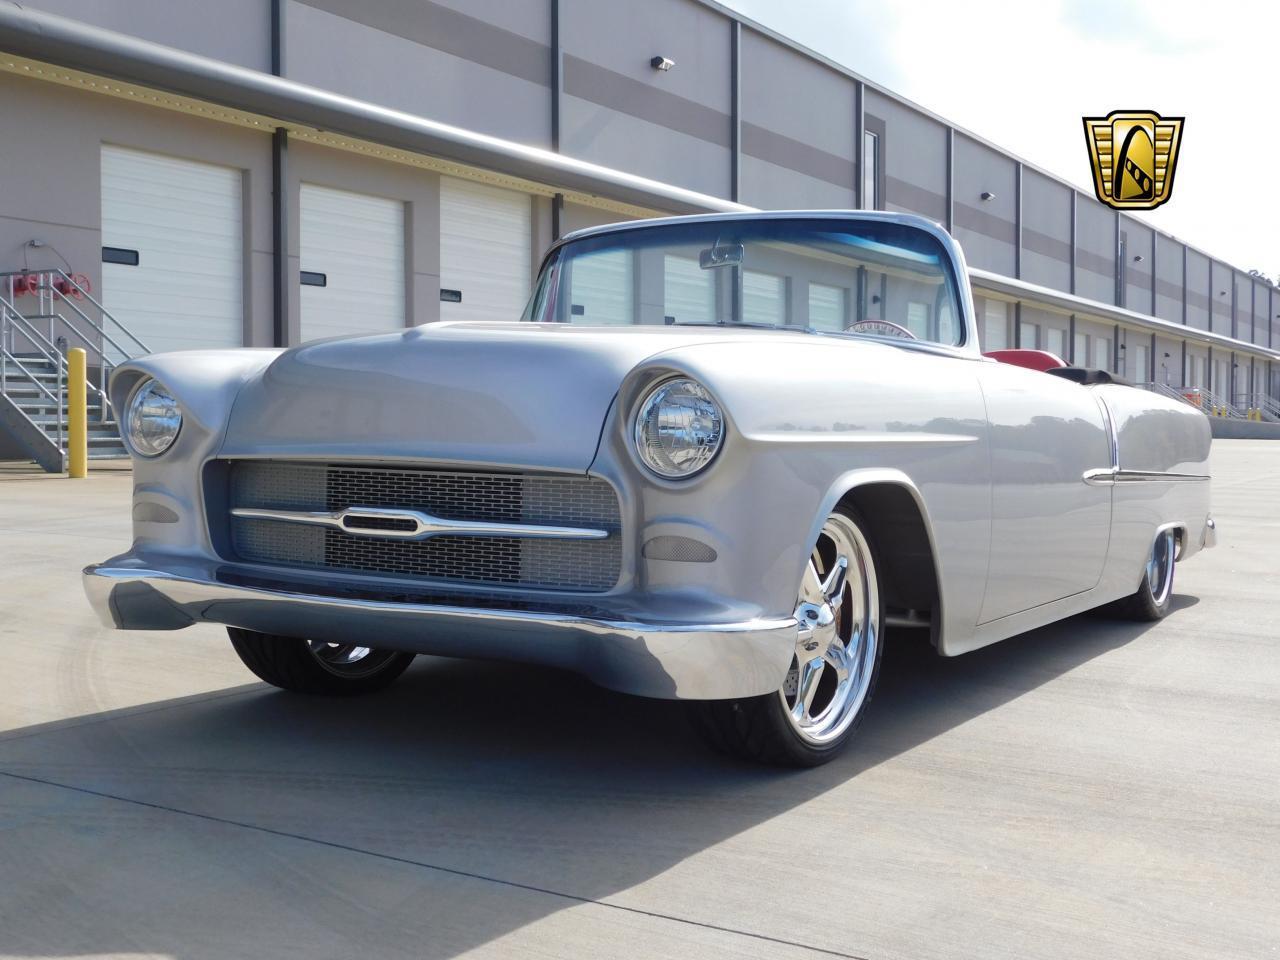 Large Picture of Classic 1955 Chevrolet Bel Air located in Georgia - $199,000.00 - MDI3